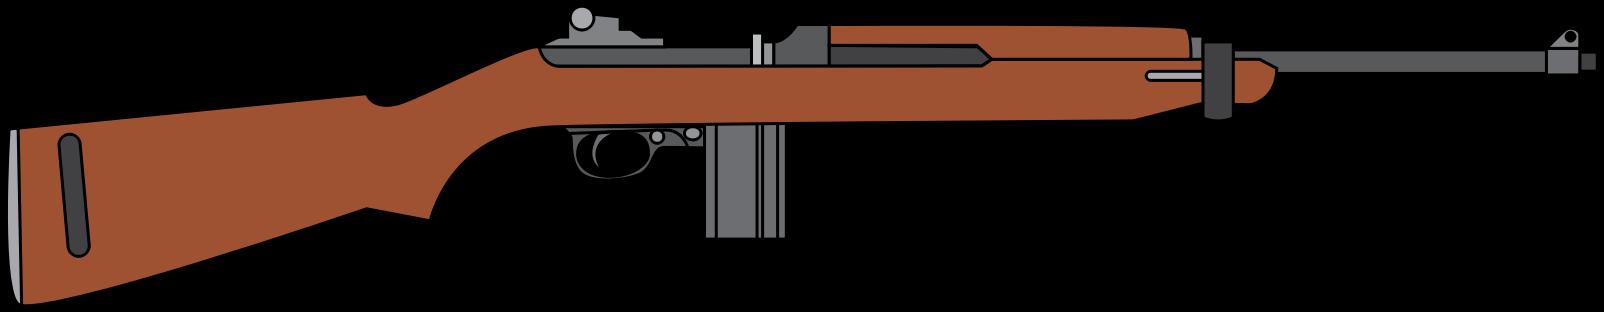 Pistol clipart rifle #12